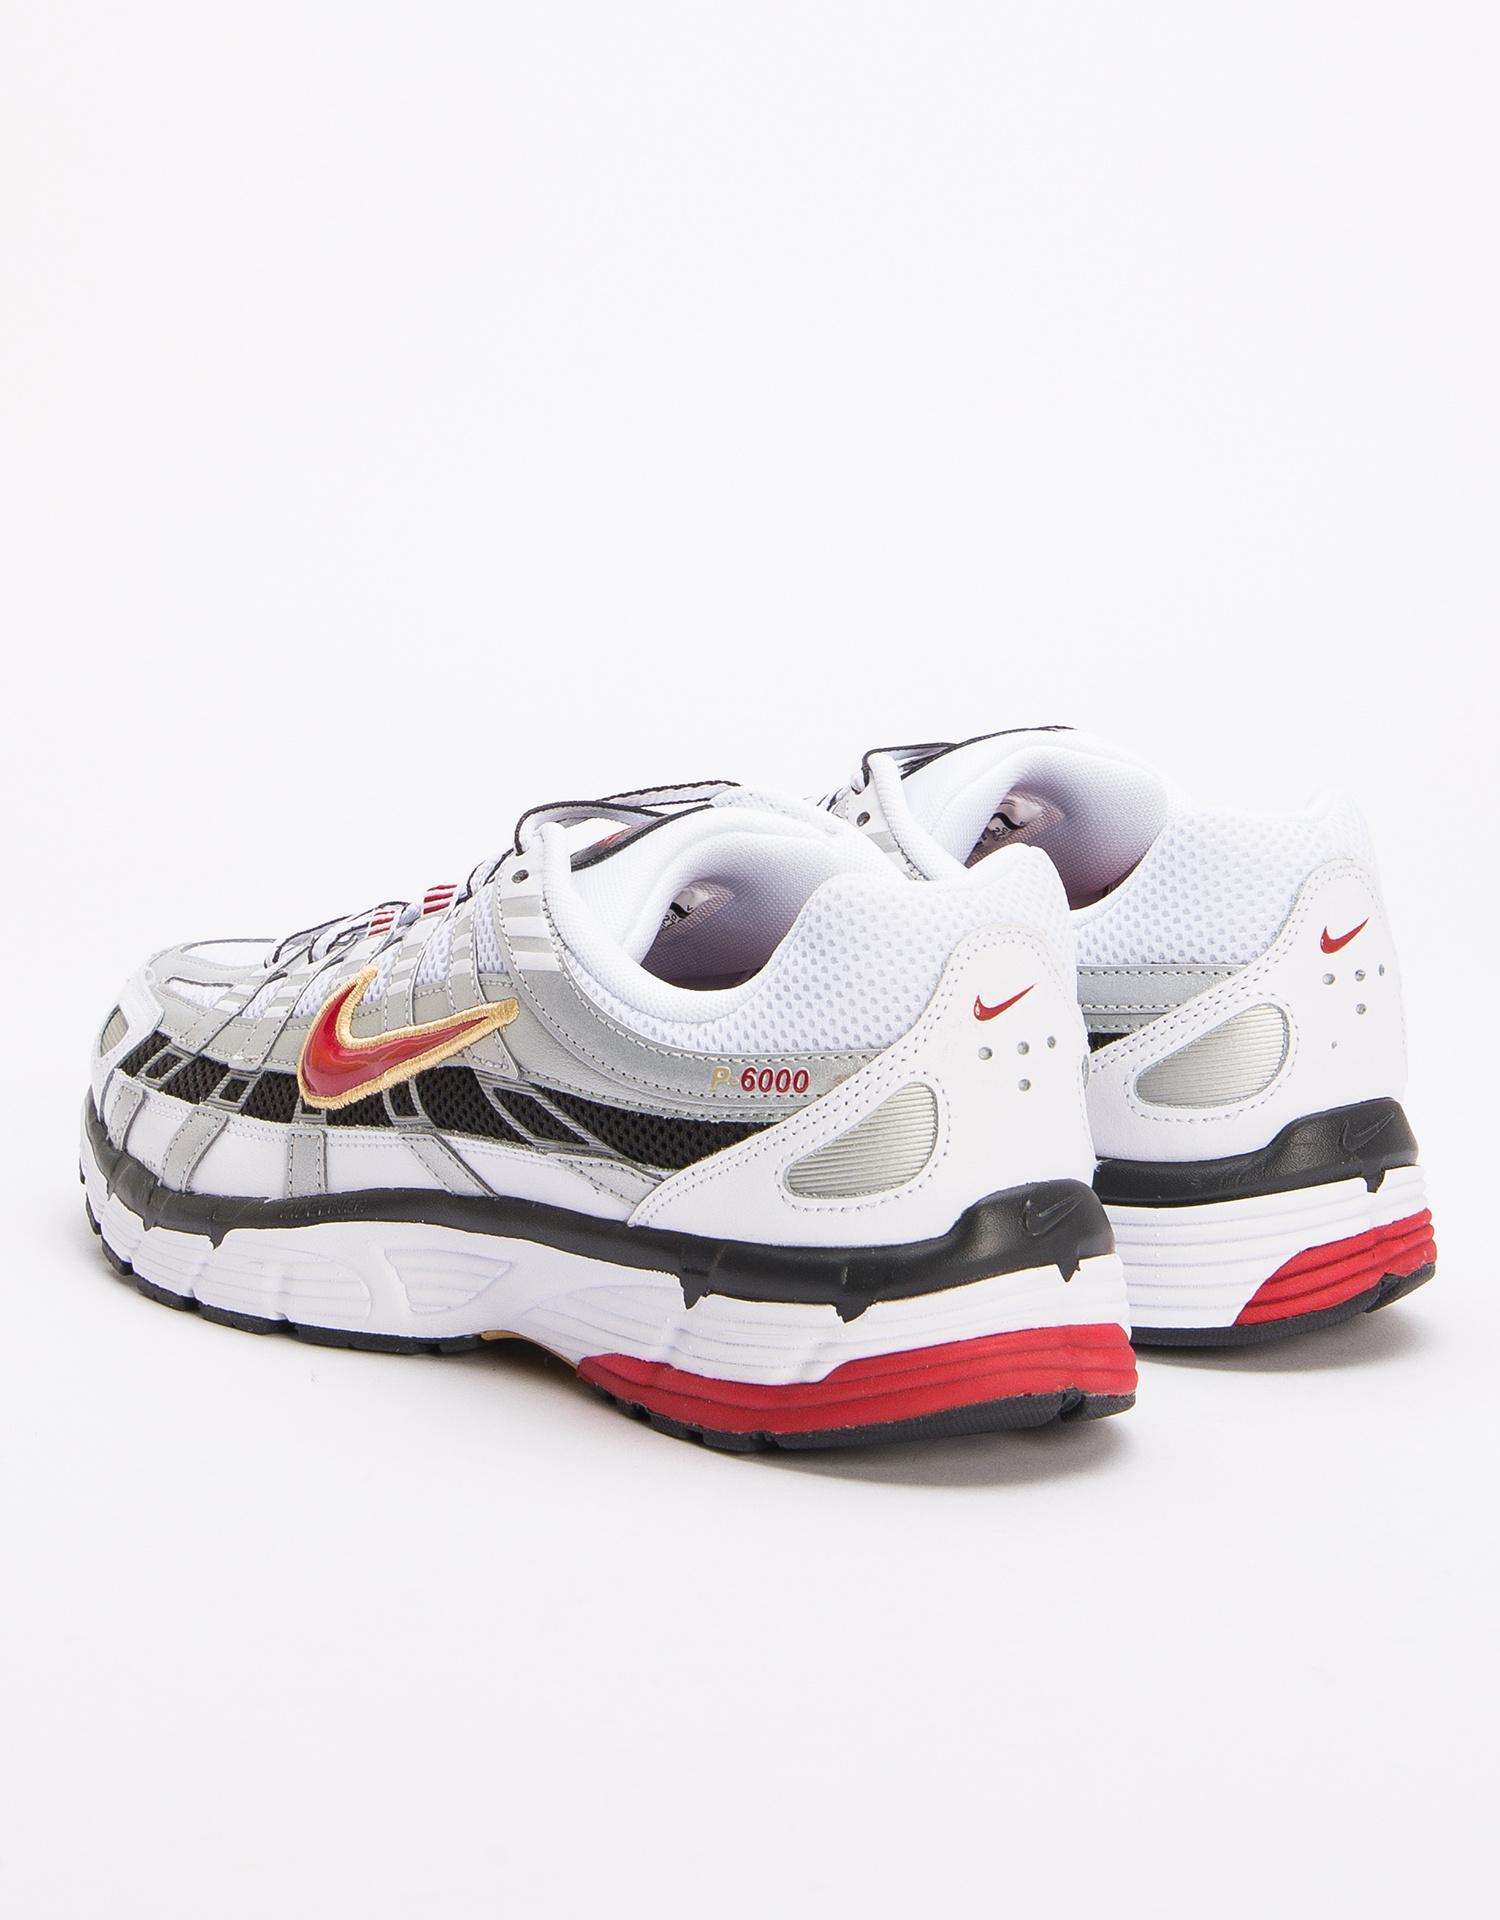 Nike P-6000 White/Varsity Red-Mtlc Platinum